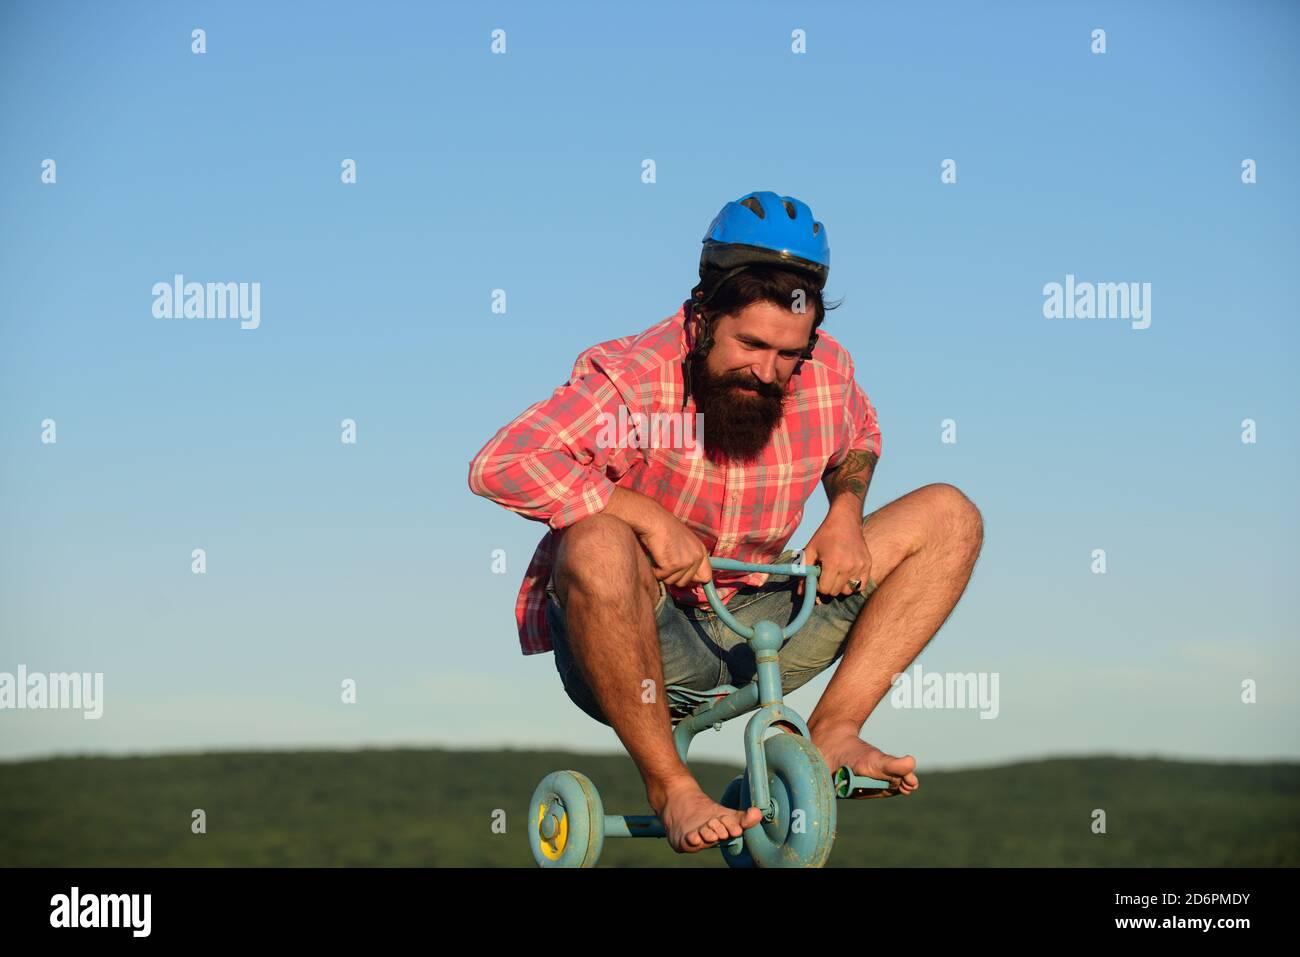 Funny man on a childrens bike. Nerdy cyclist riding. Stock Photo